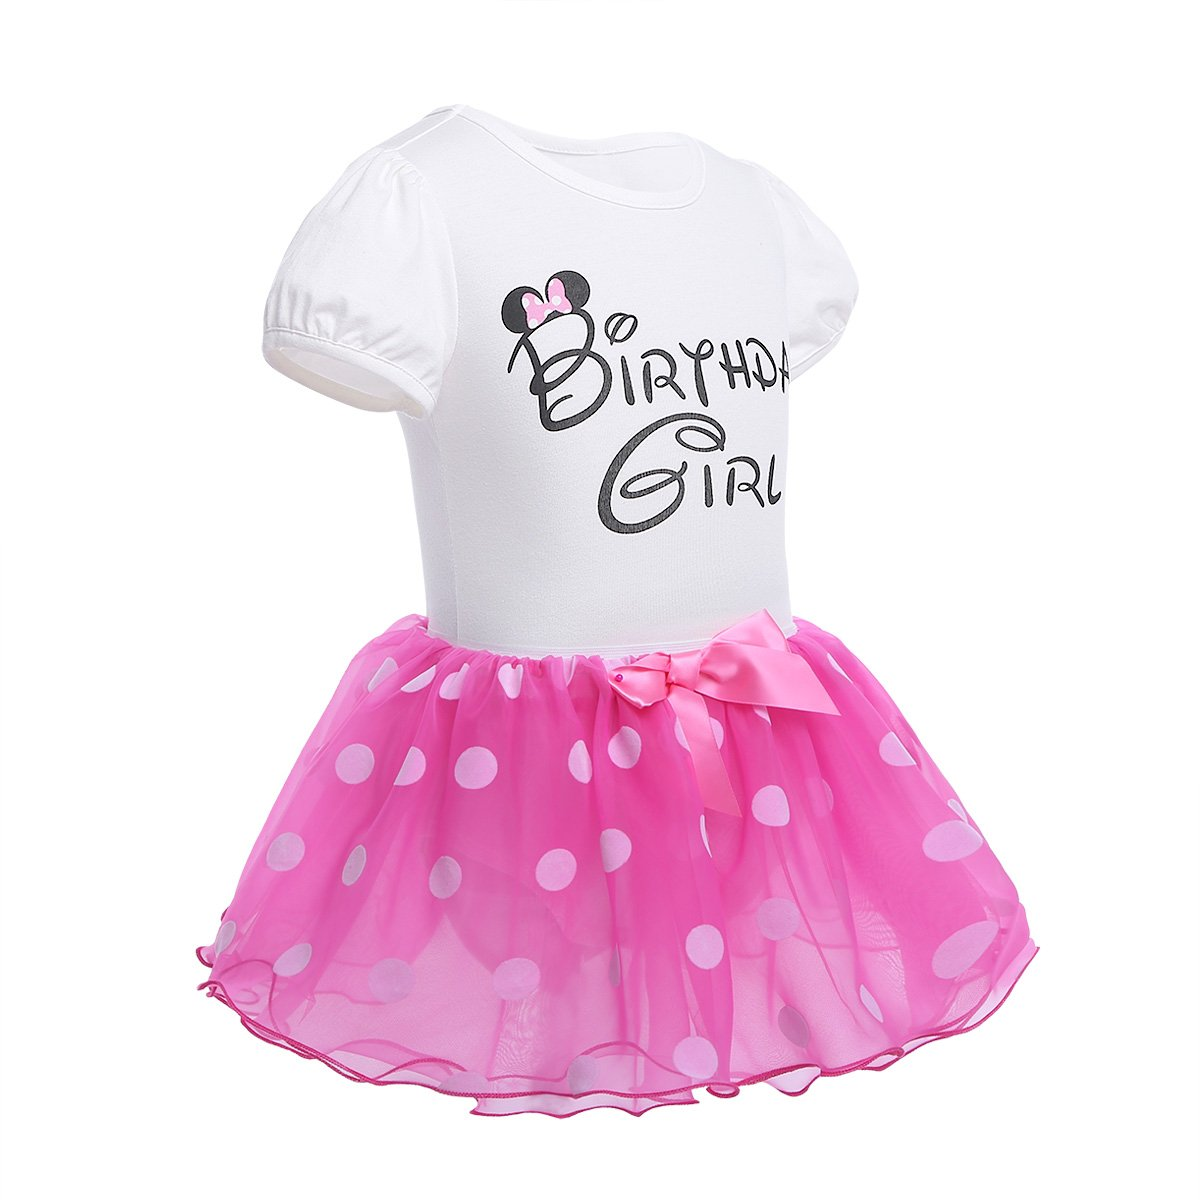 iiniim Newborn Baby Infant Toddler Girls Its My 1st Birthday Cake Smash Shiny Printed Sequin Bow Tutu Princess Dress Outfit